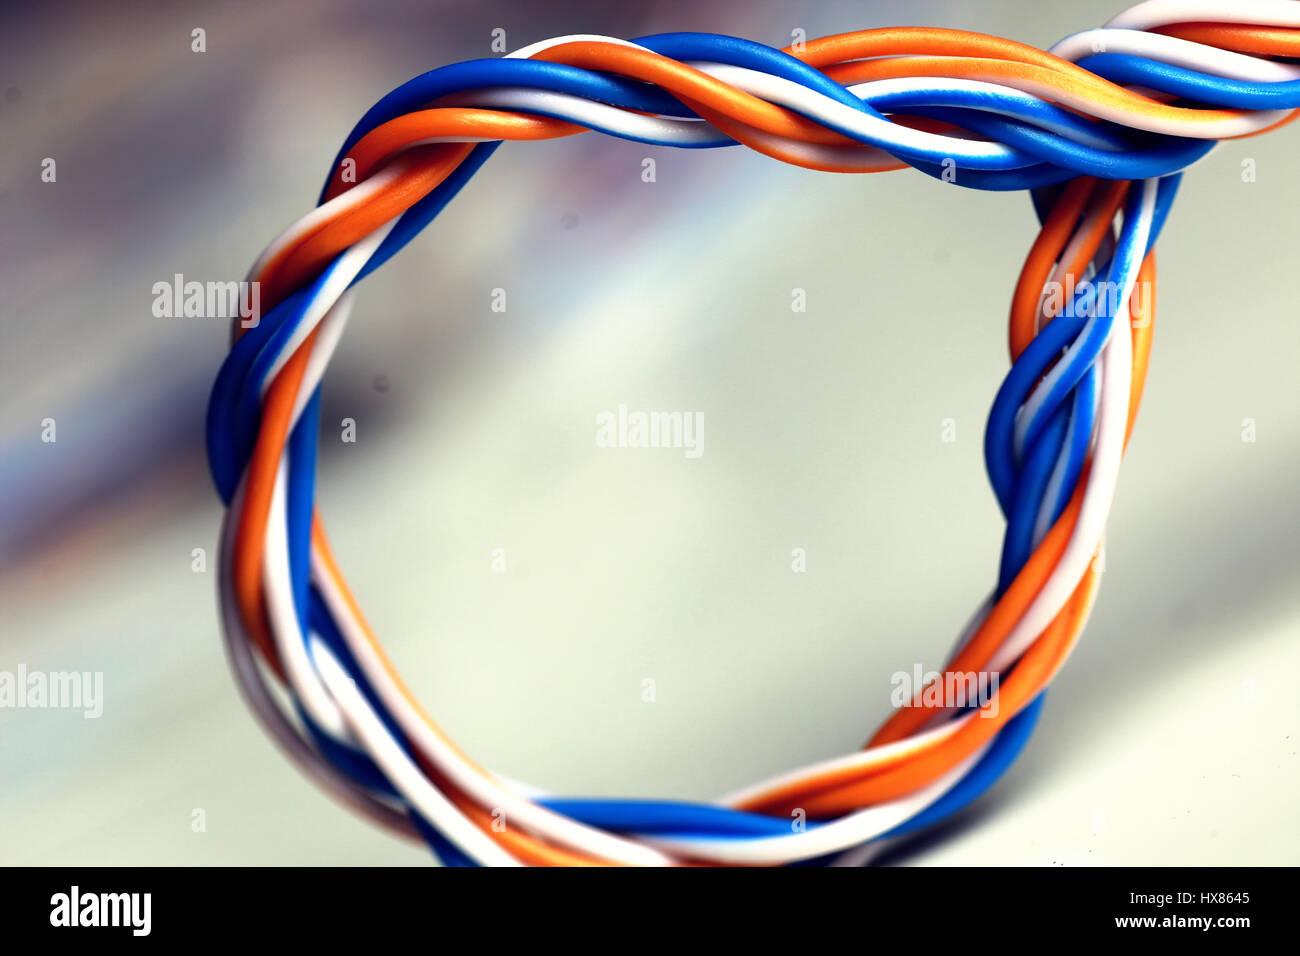 plug wire color lan Stock Photo: 136634069 - Alamy